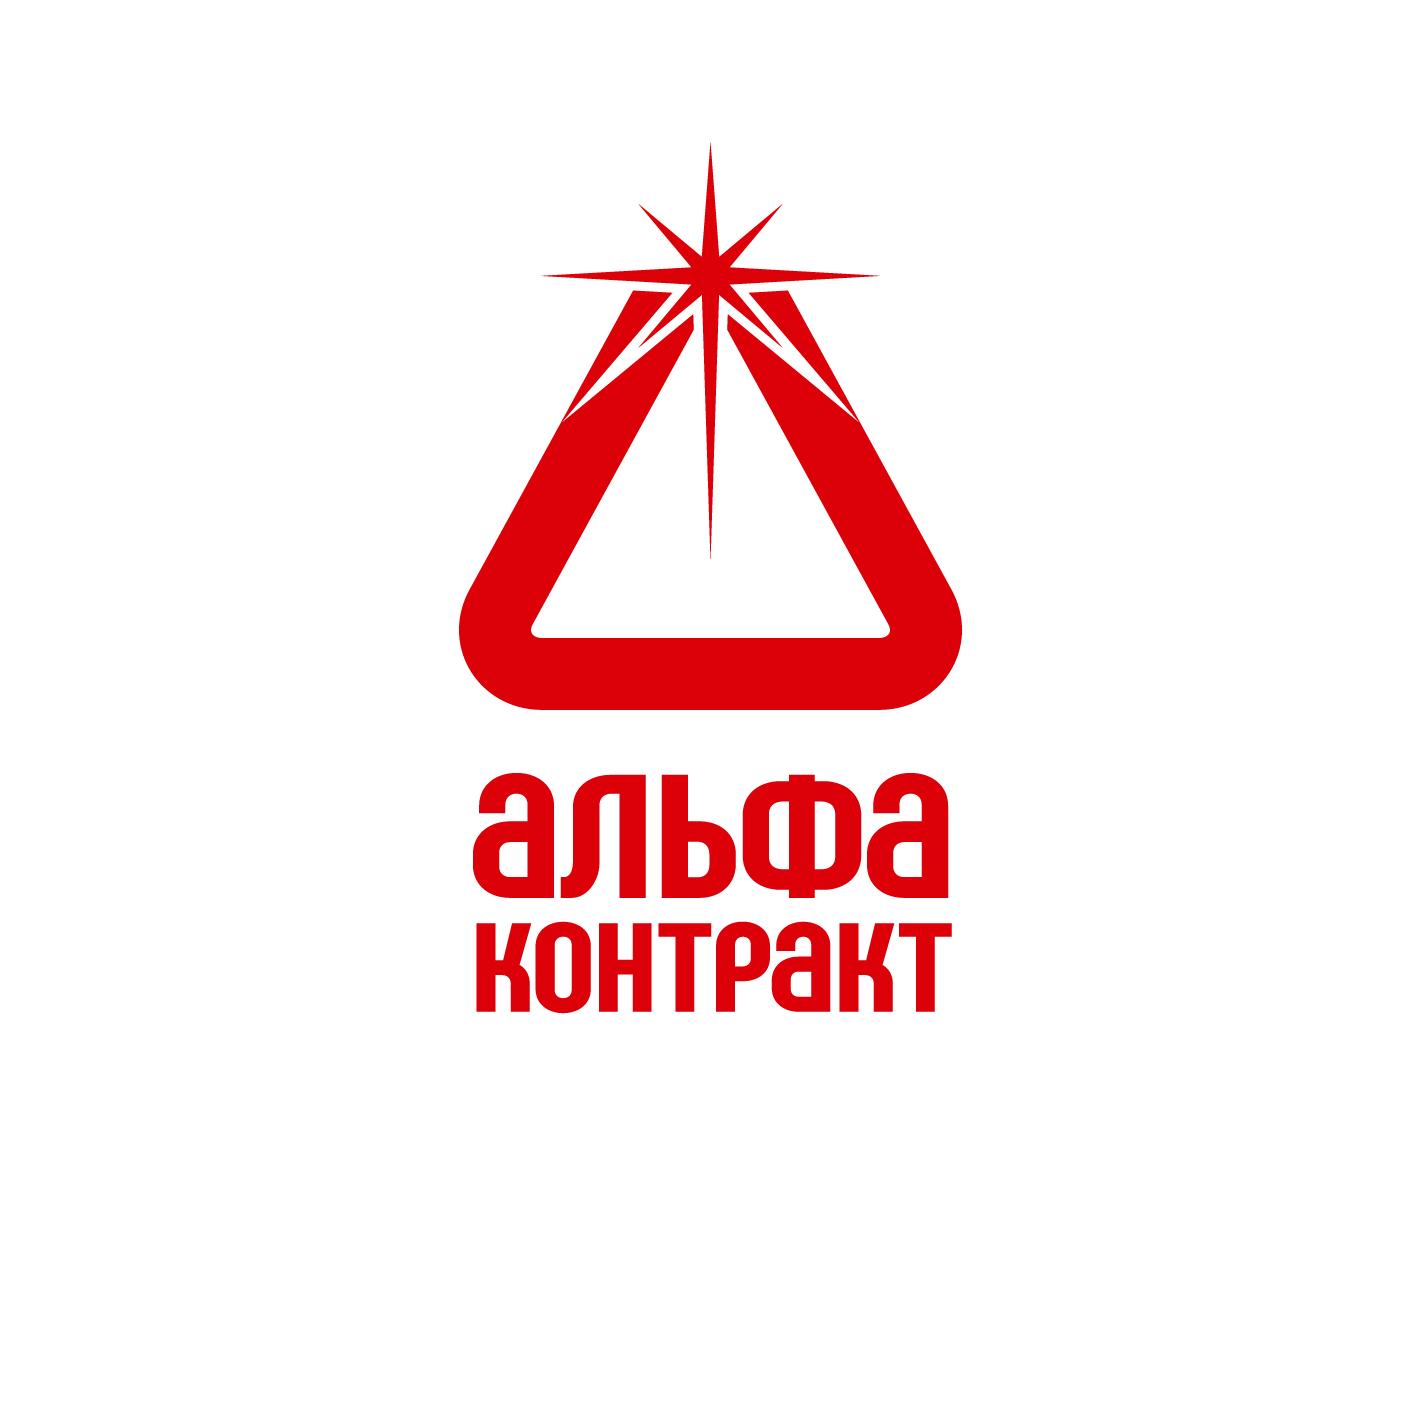 Дизайнер для разработки логотипа компании фото f_4755bf6dd0eab19e.png